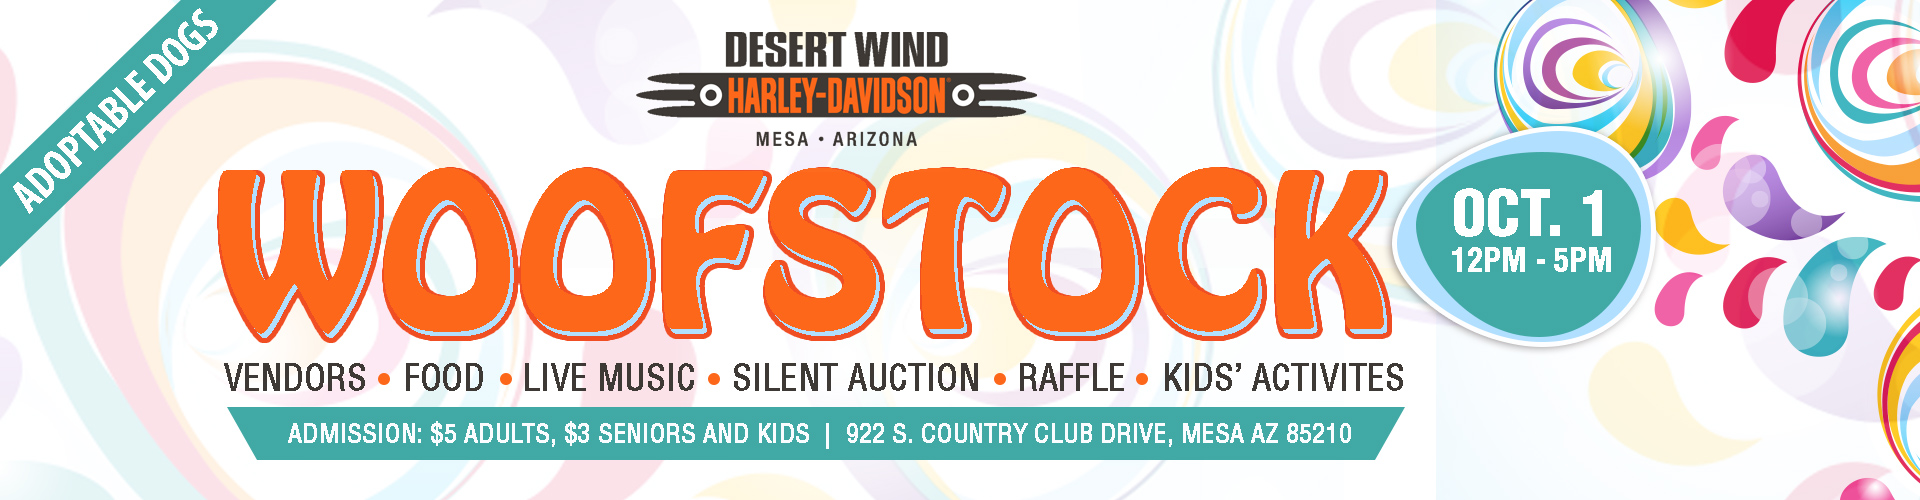 Woofstock at Desert Winds Harley Davidson